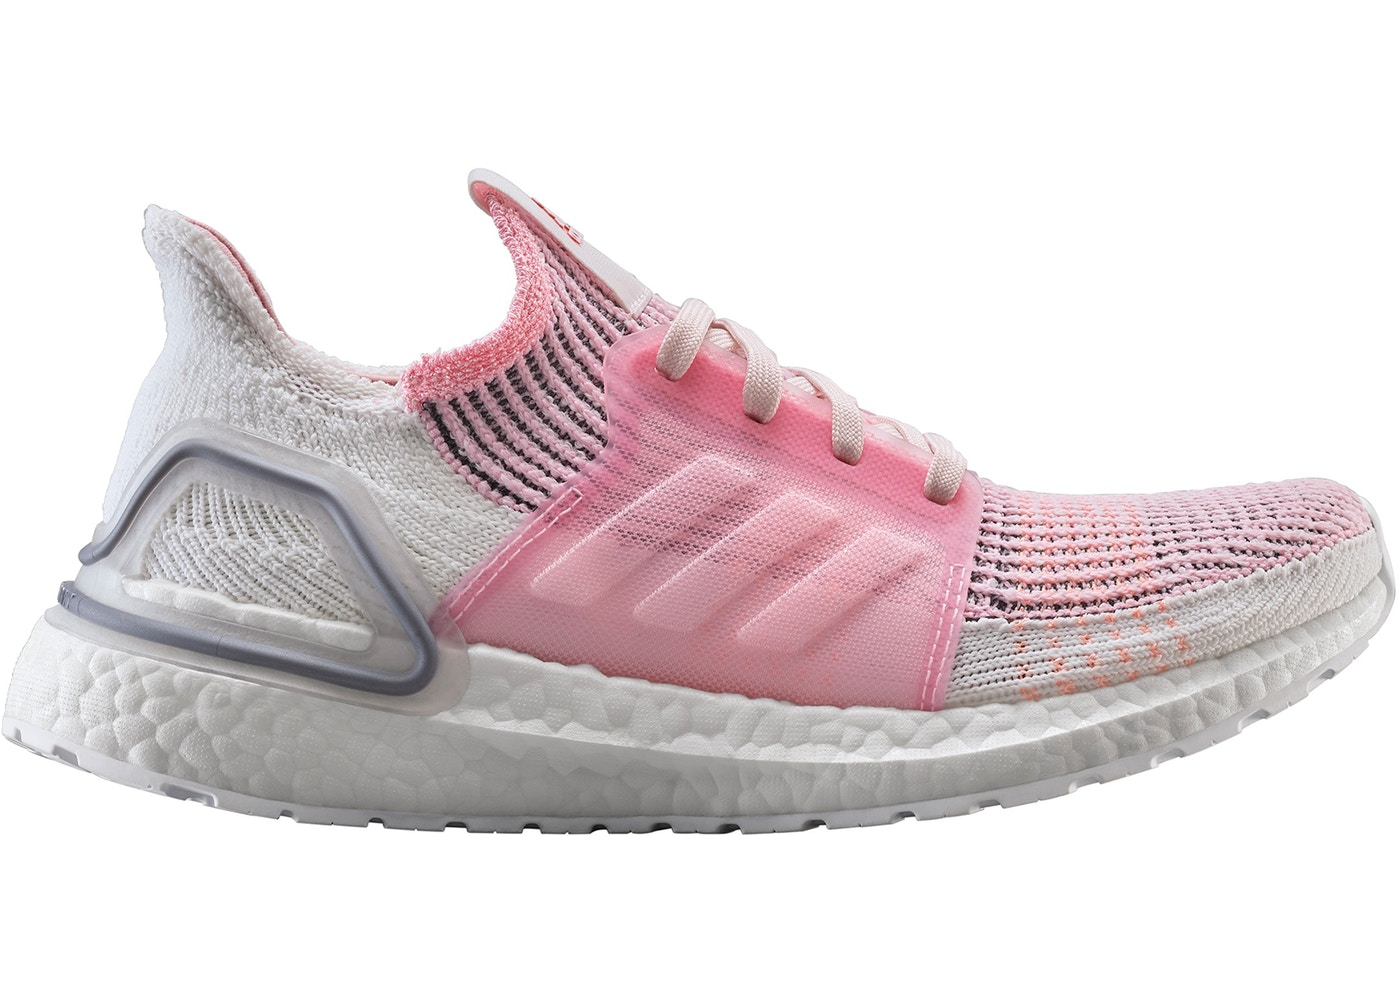 Adidas Ultra Boost 19 True Pink Orchid Tint W Ef6517